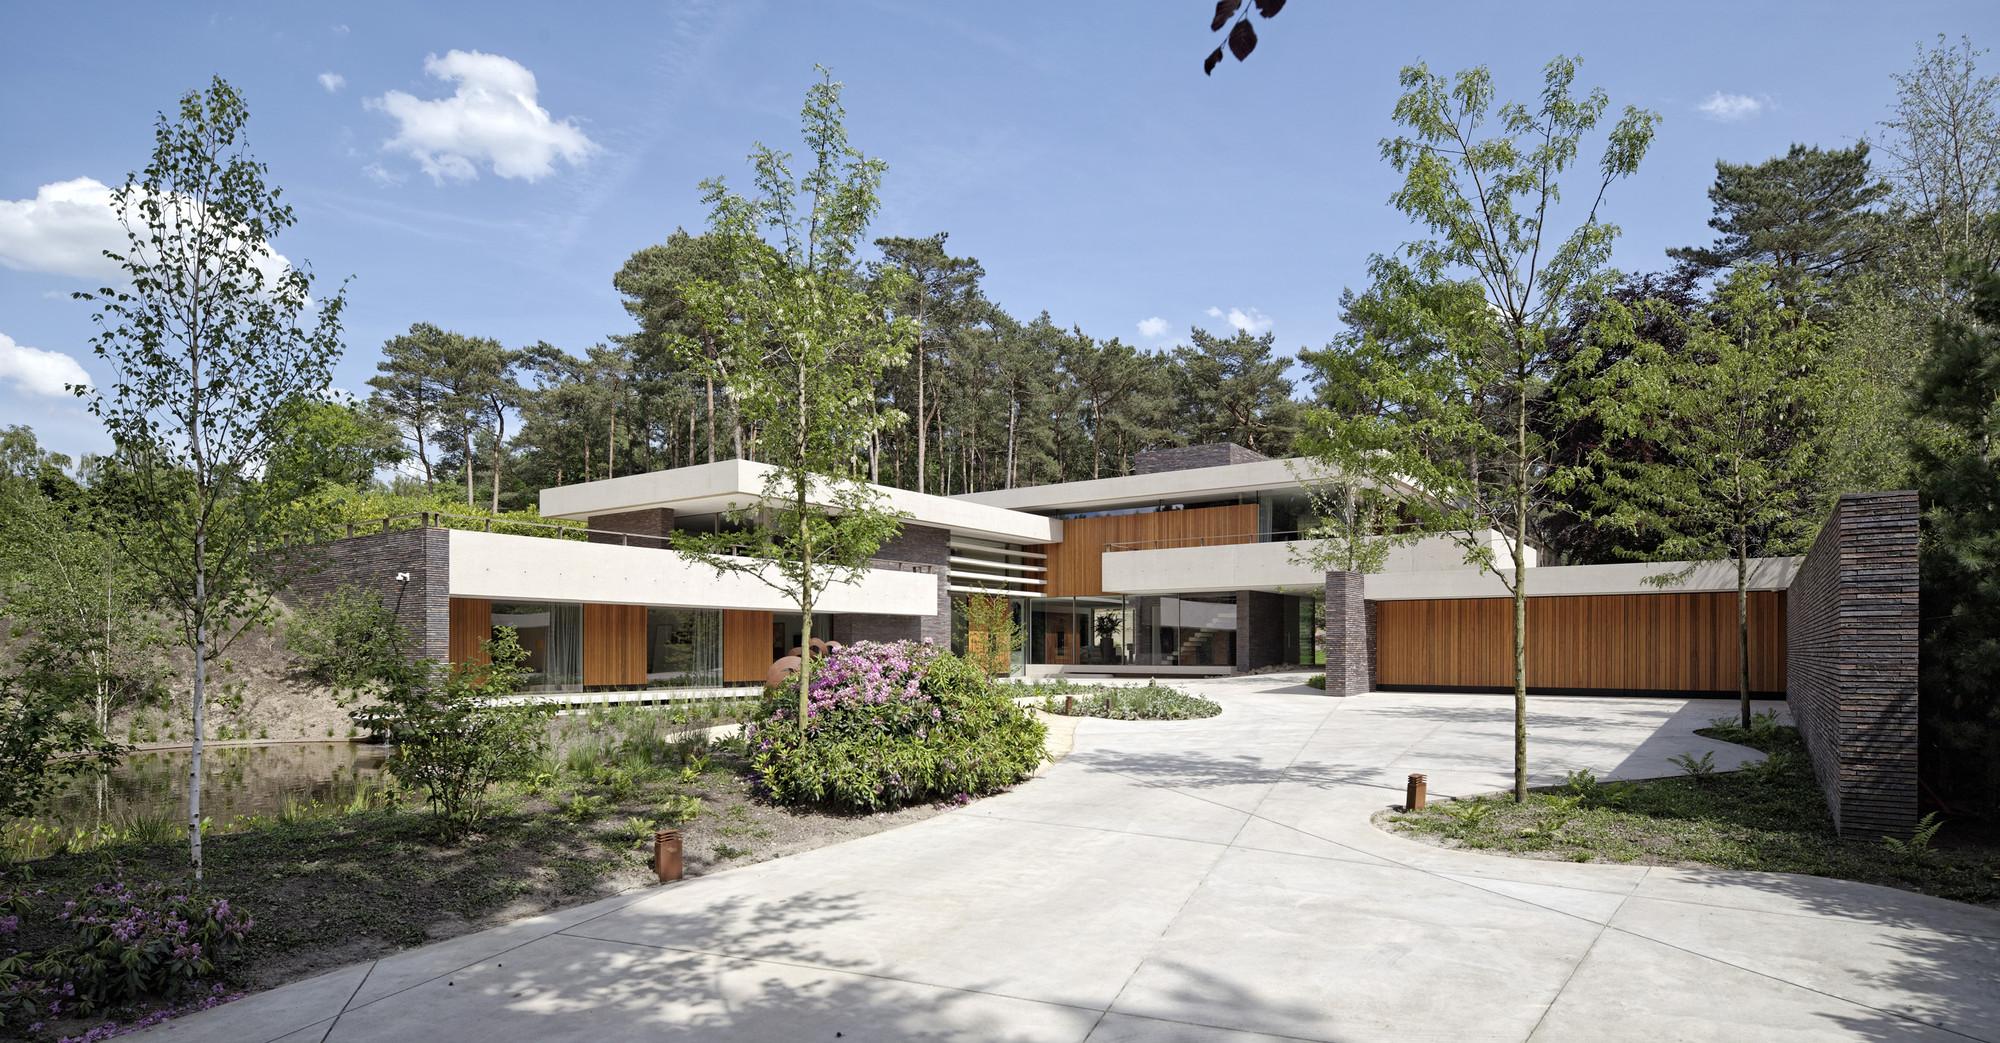 Gallery of dune villa hilberinkbosch architects 14 for Interieur architecten